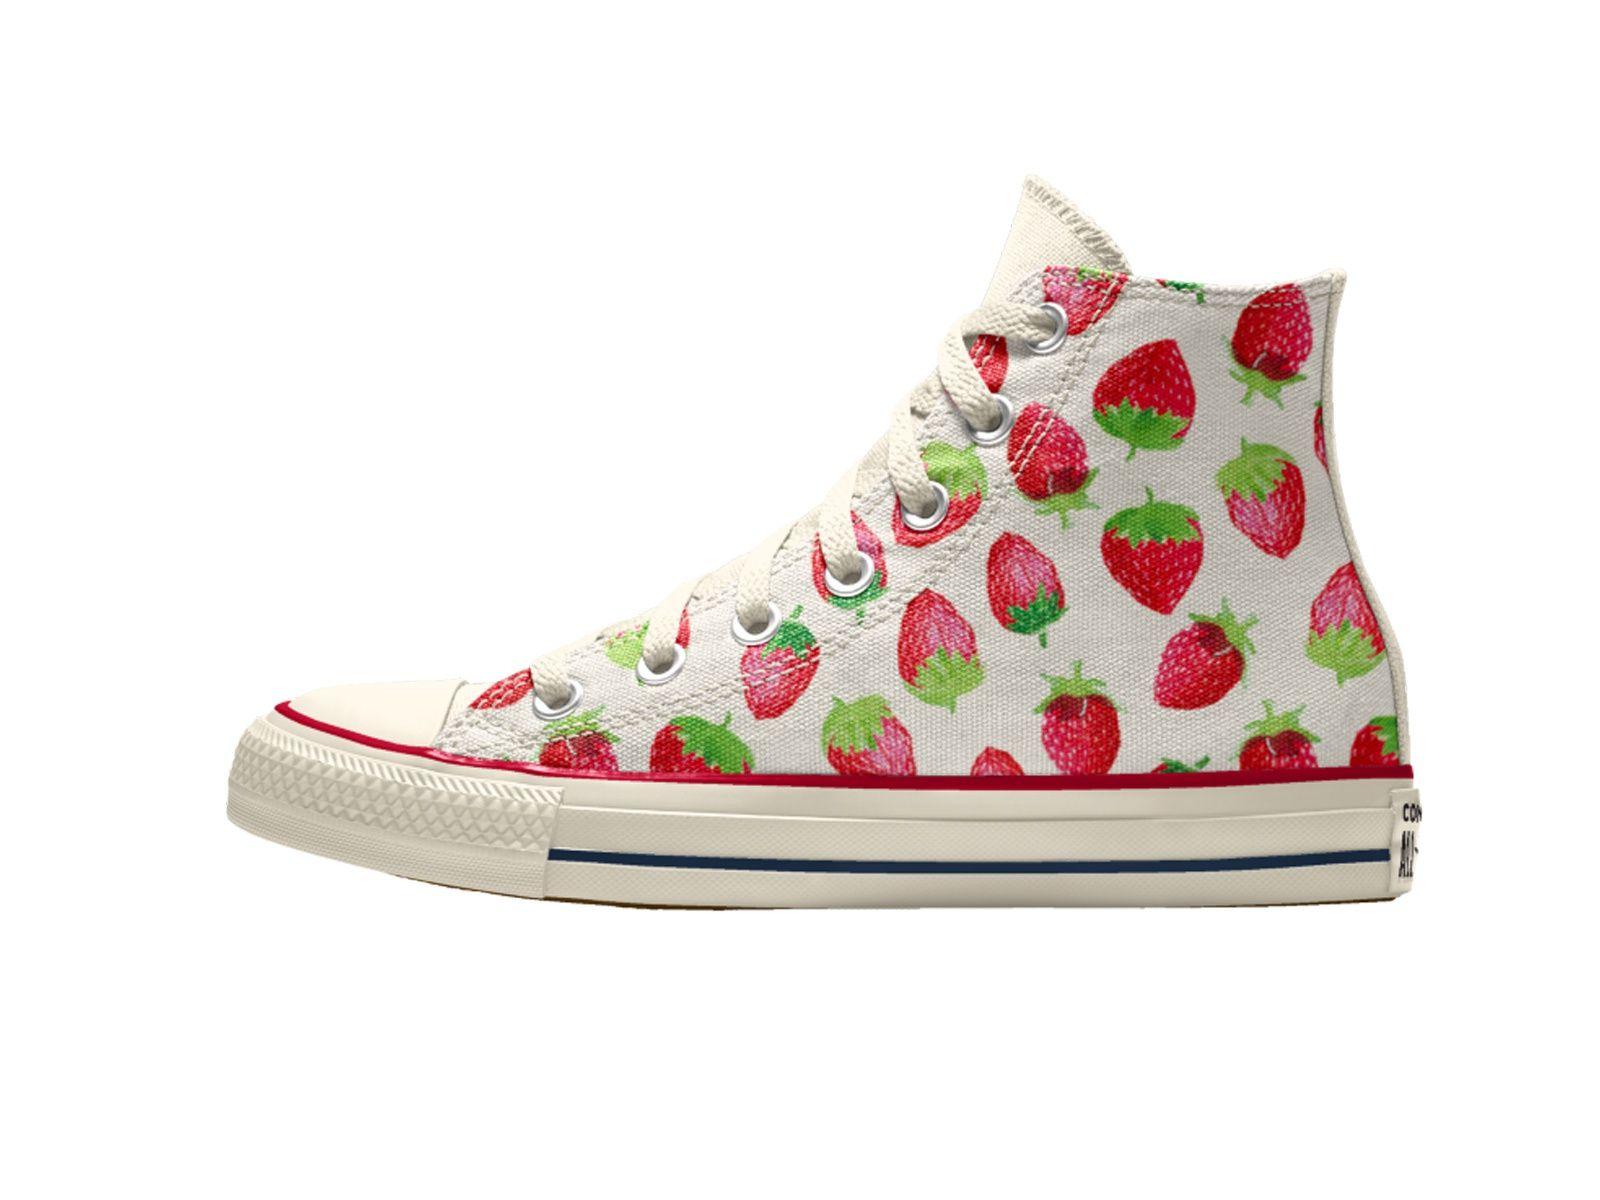 Converse Strawberry Pattern Spring 2020